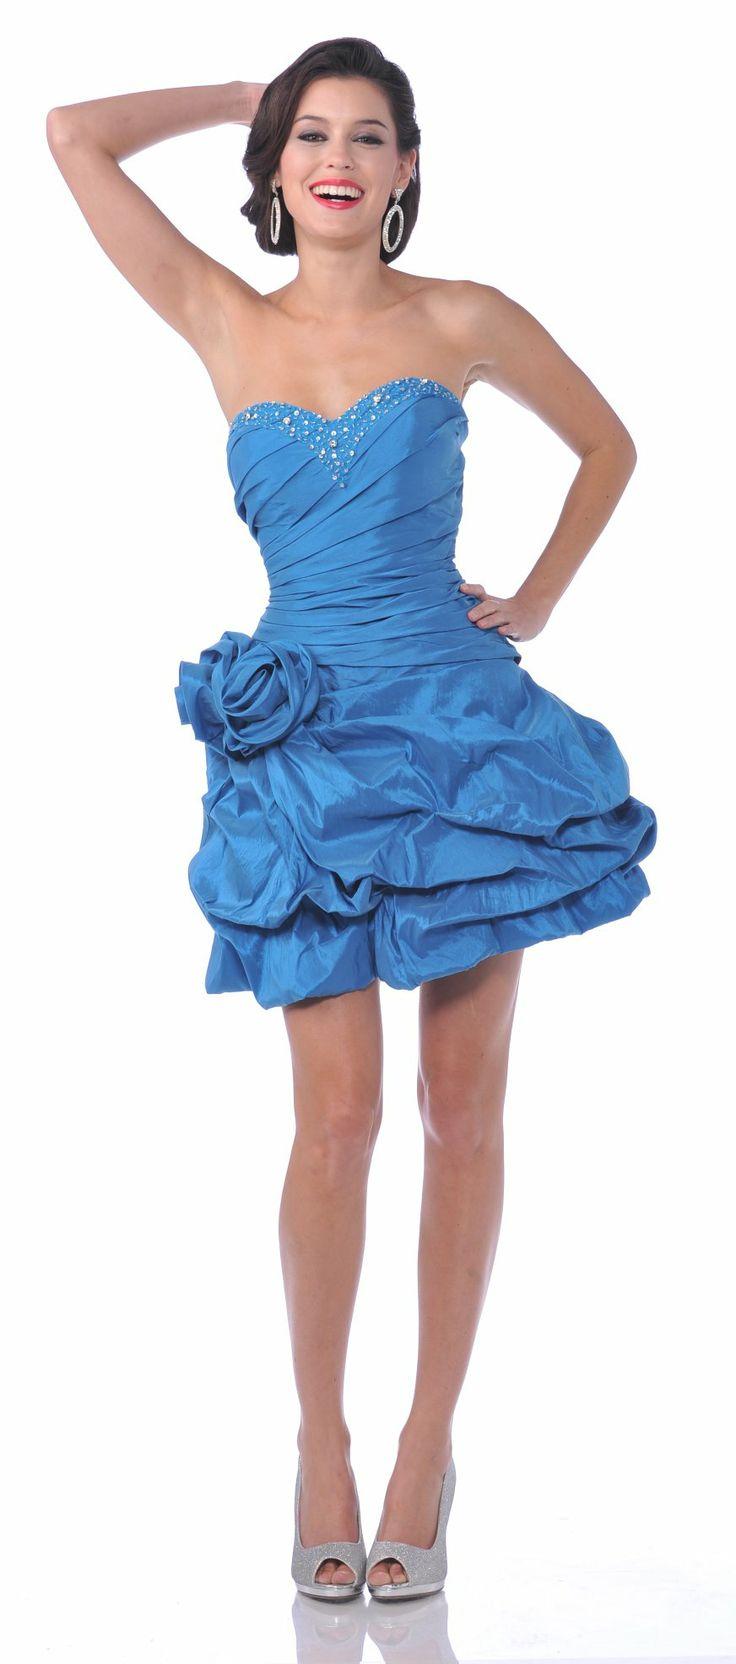 81 best ; ) prom images on Pinterest | Class reunion ideas ...